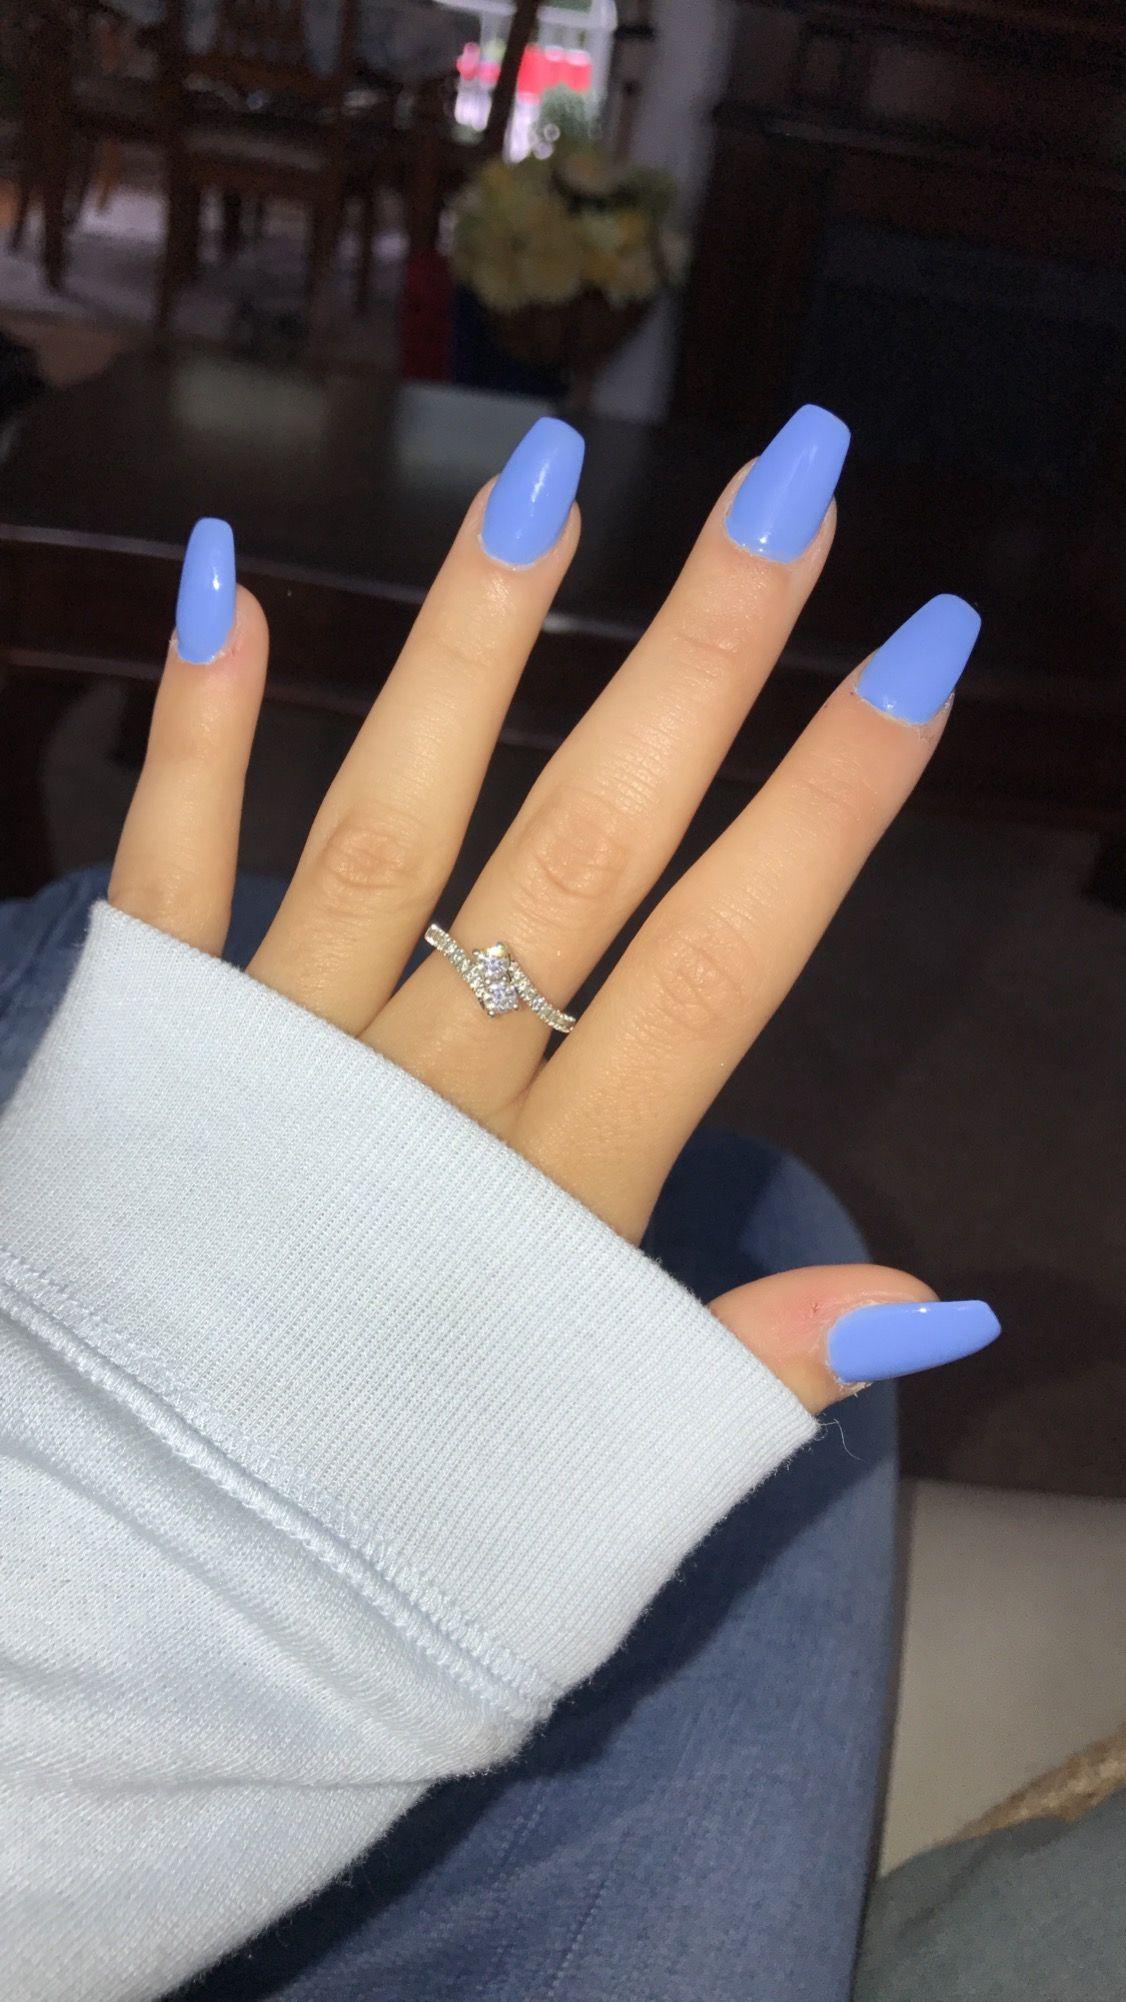 Blue Coffin Ballerina Shaped Acrylic Nails Acrylic Nails Coffin Short Coffin Shape Nails Short Acrylic Nails